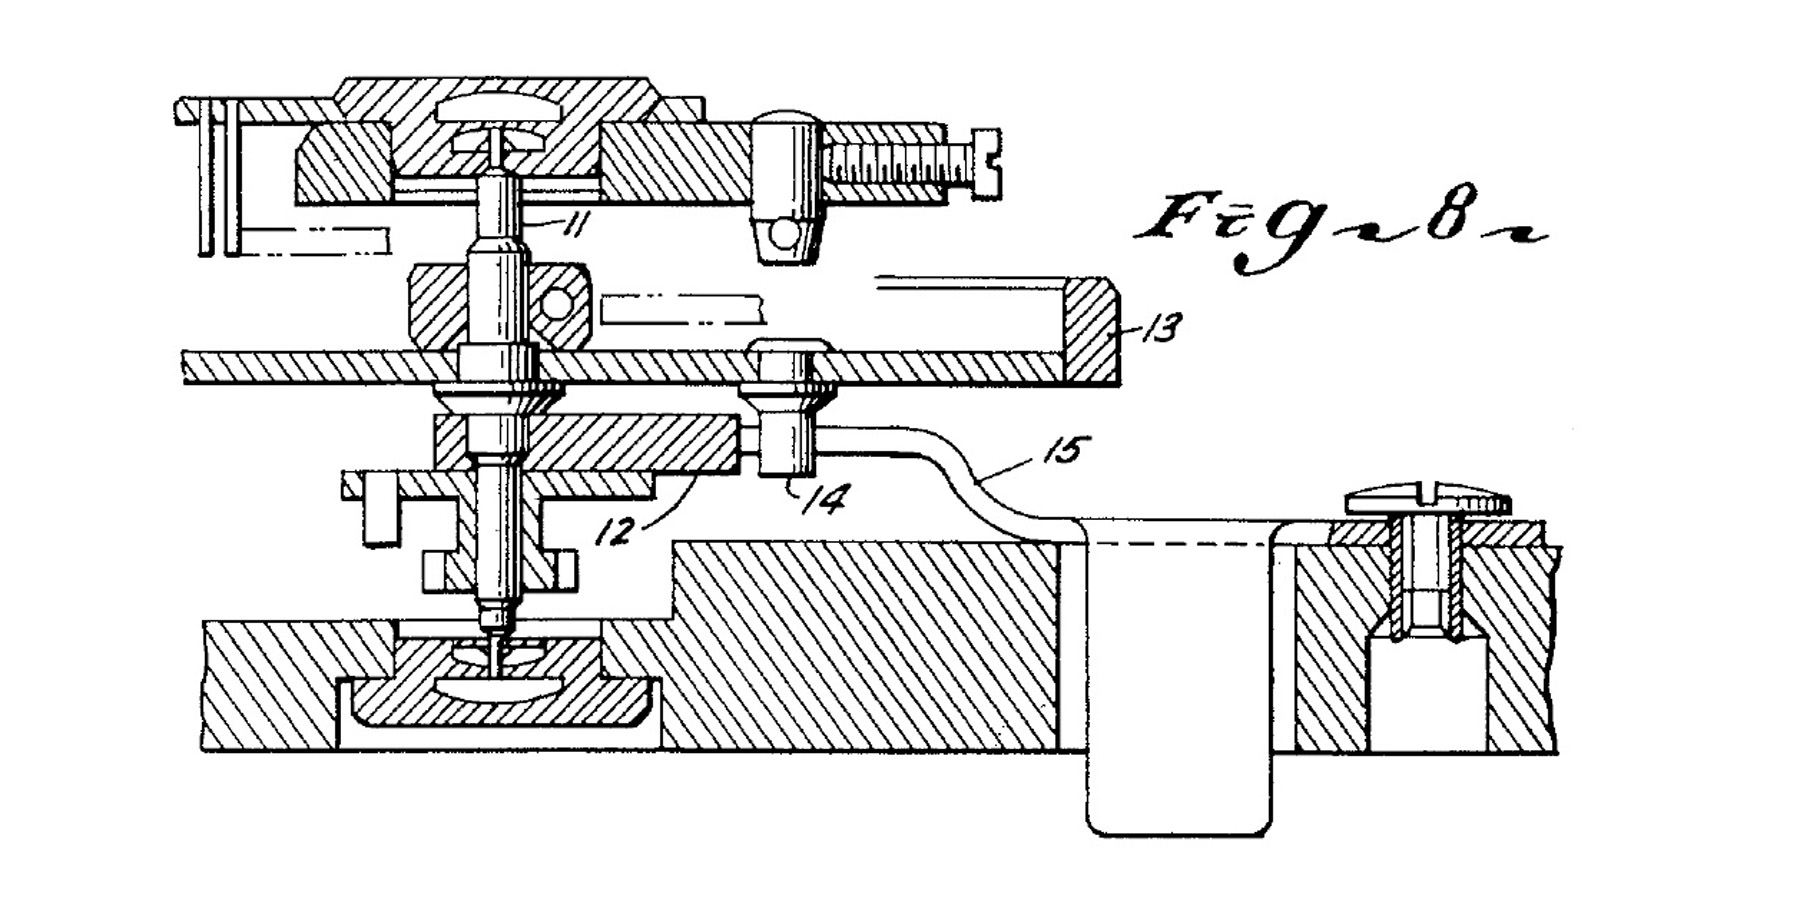 US Patent: US3168803A